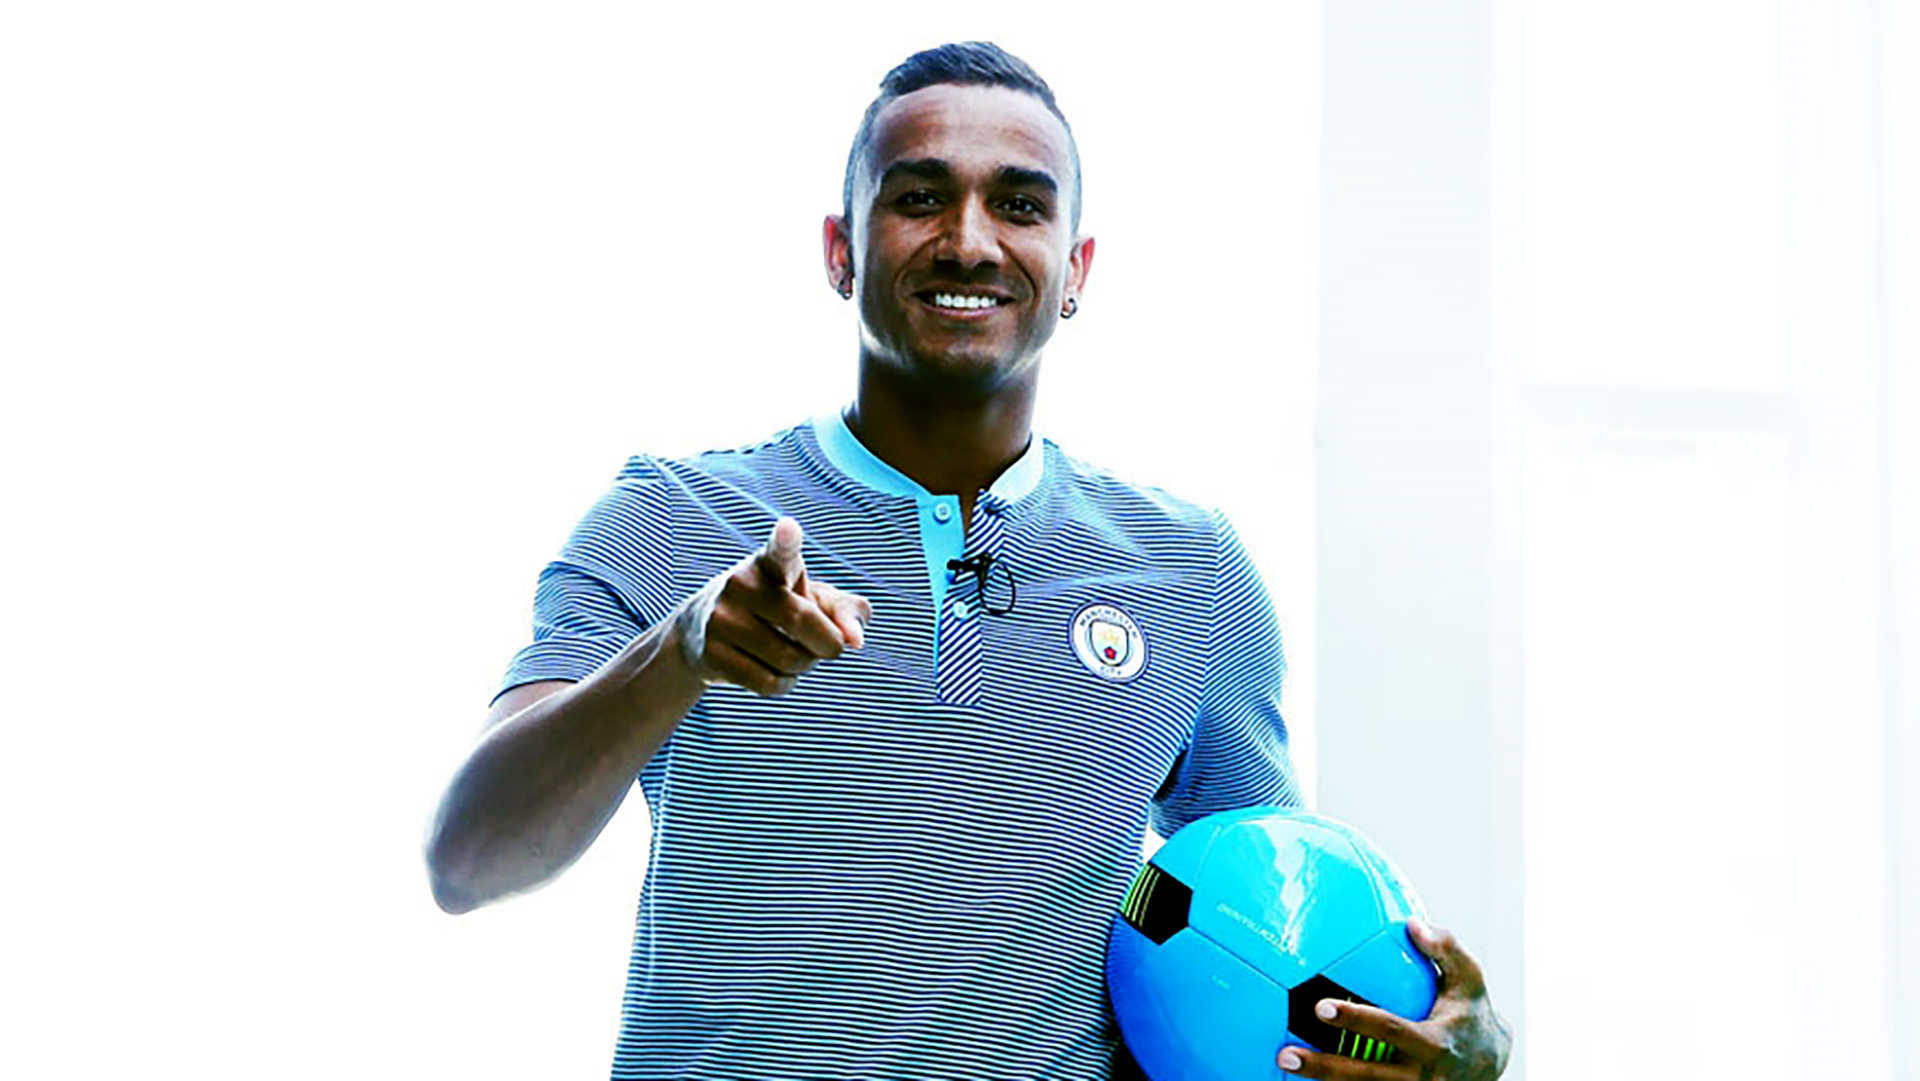 Danilo Luiz Manchester City unveiling 07232017